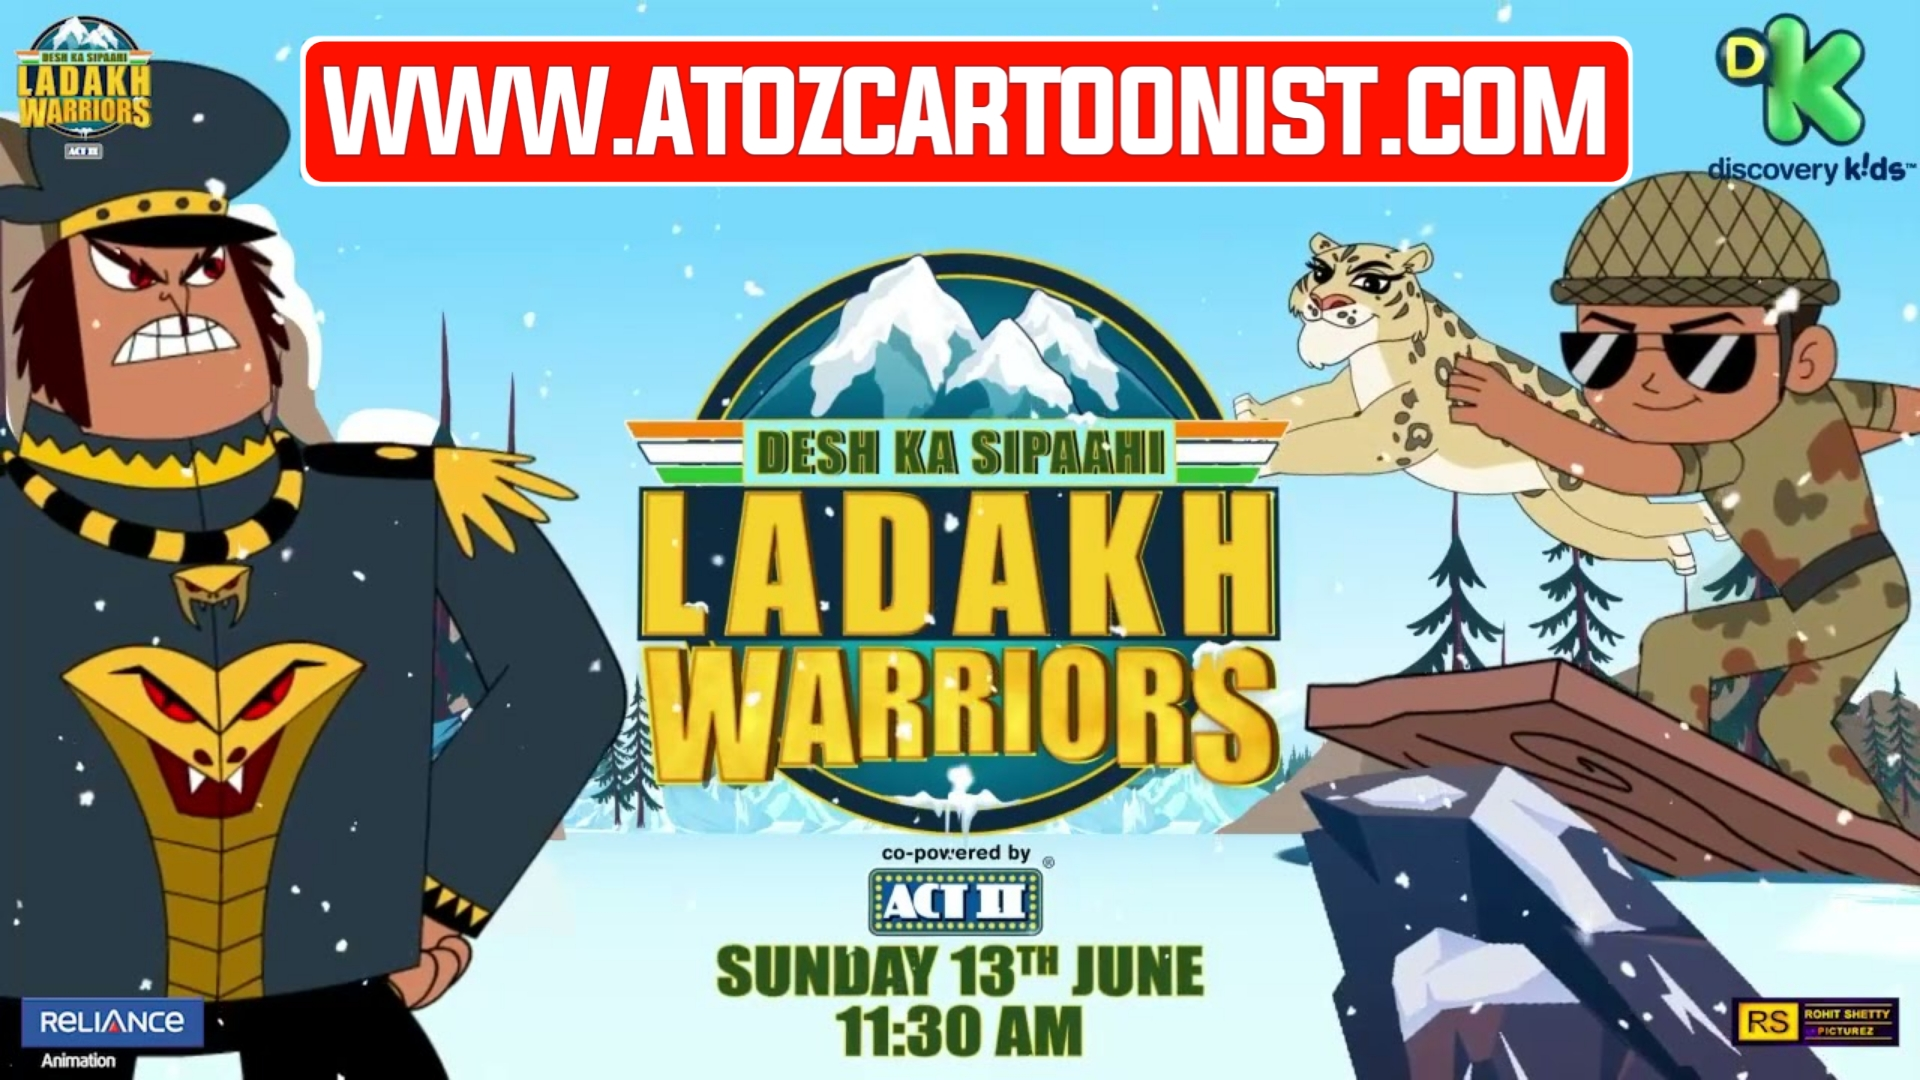 LITTLE SINGHAM DESH KA SIPAAHI : LADAKH WARRIORS FULL MOVIE IN HINDI DOWNLOAD (480P HQ)